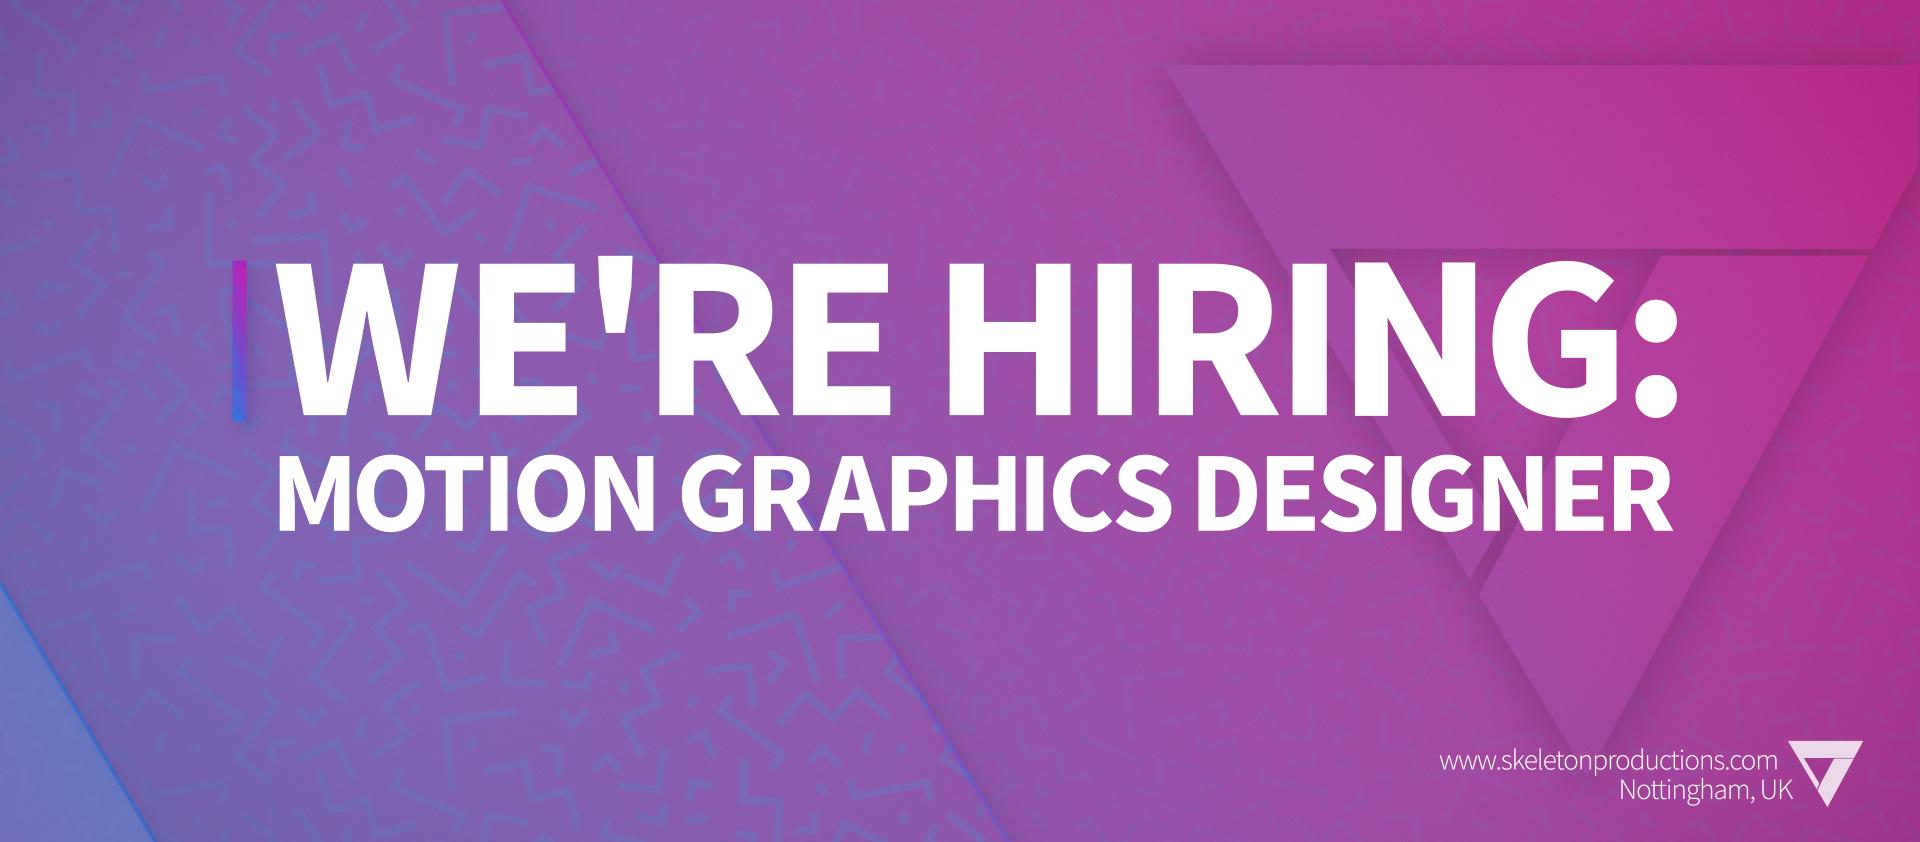 Motion Graphics Designer Job Nottingham